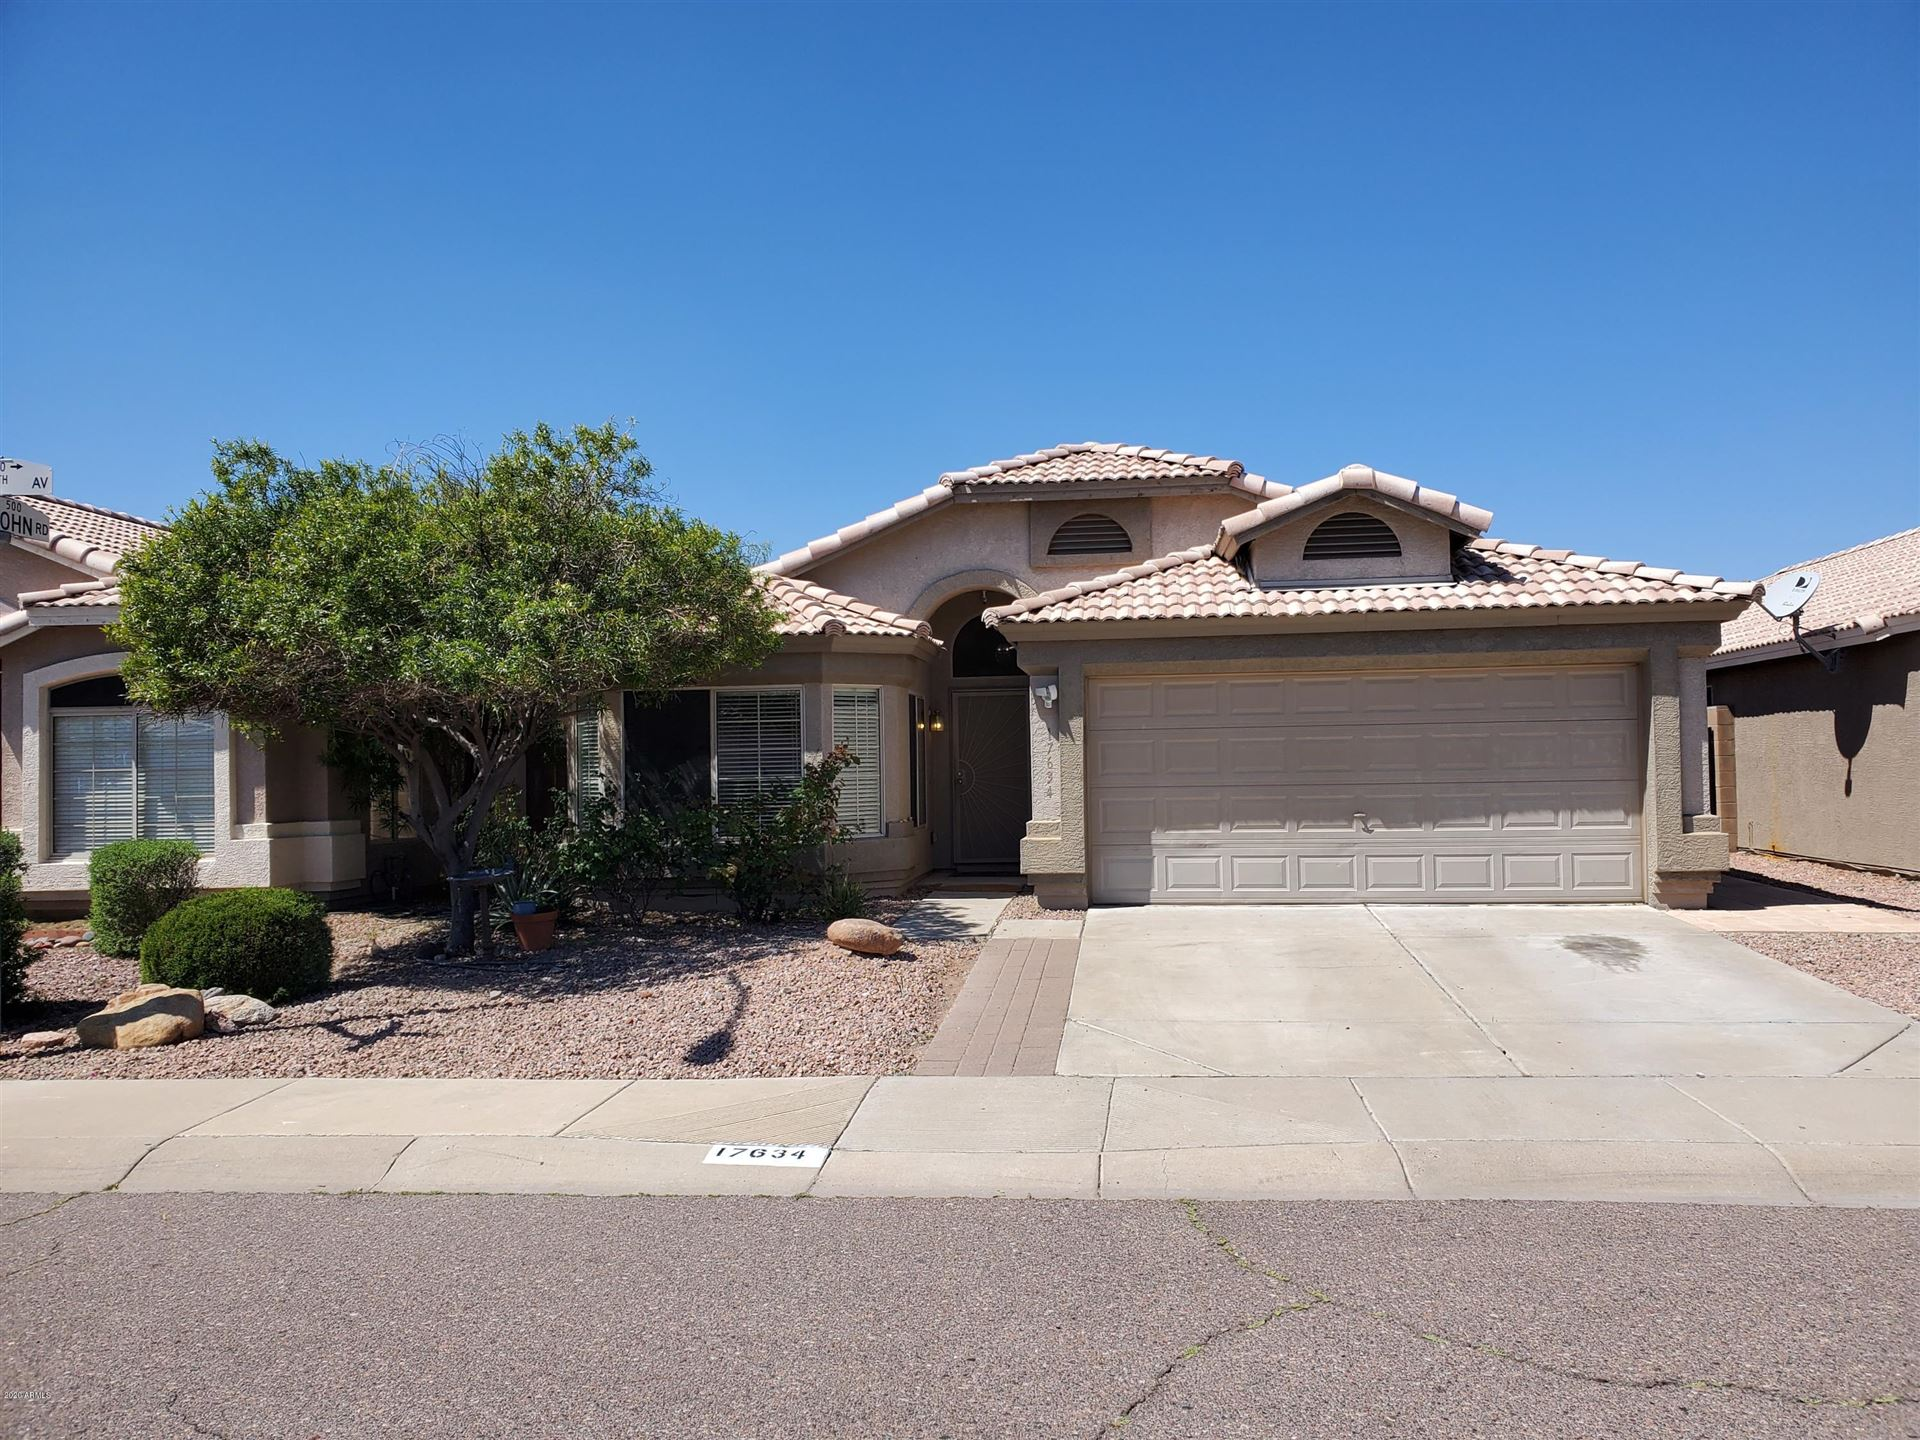 17634 N 6TH Avenue, Phoenix, AZ 85023 - MLS#: 6061328